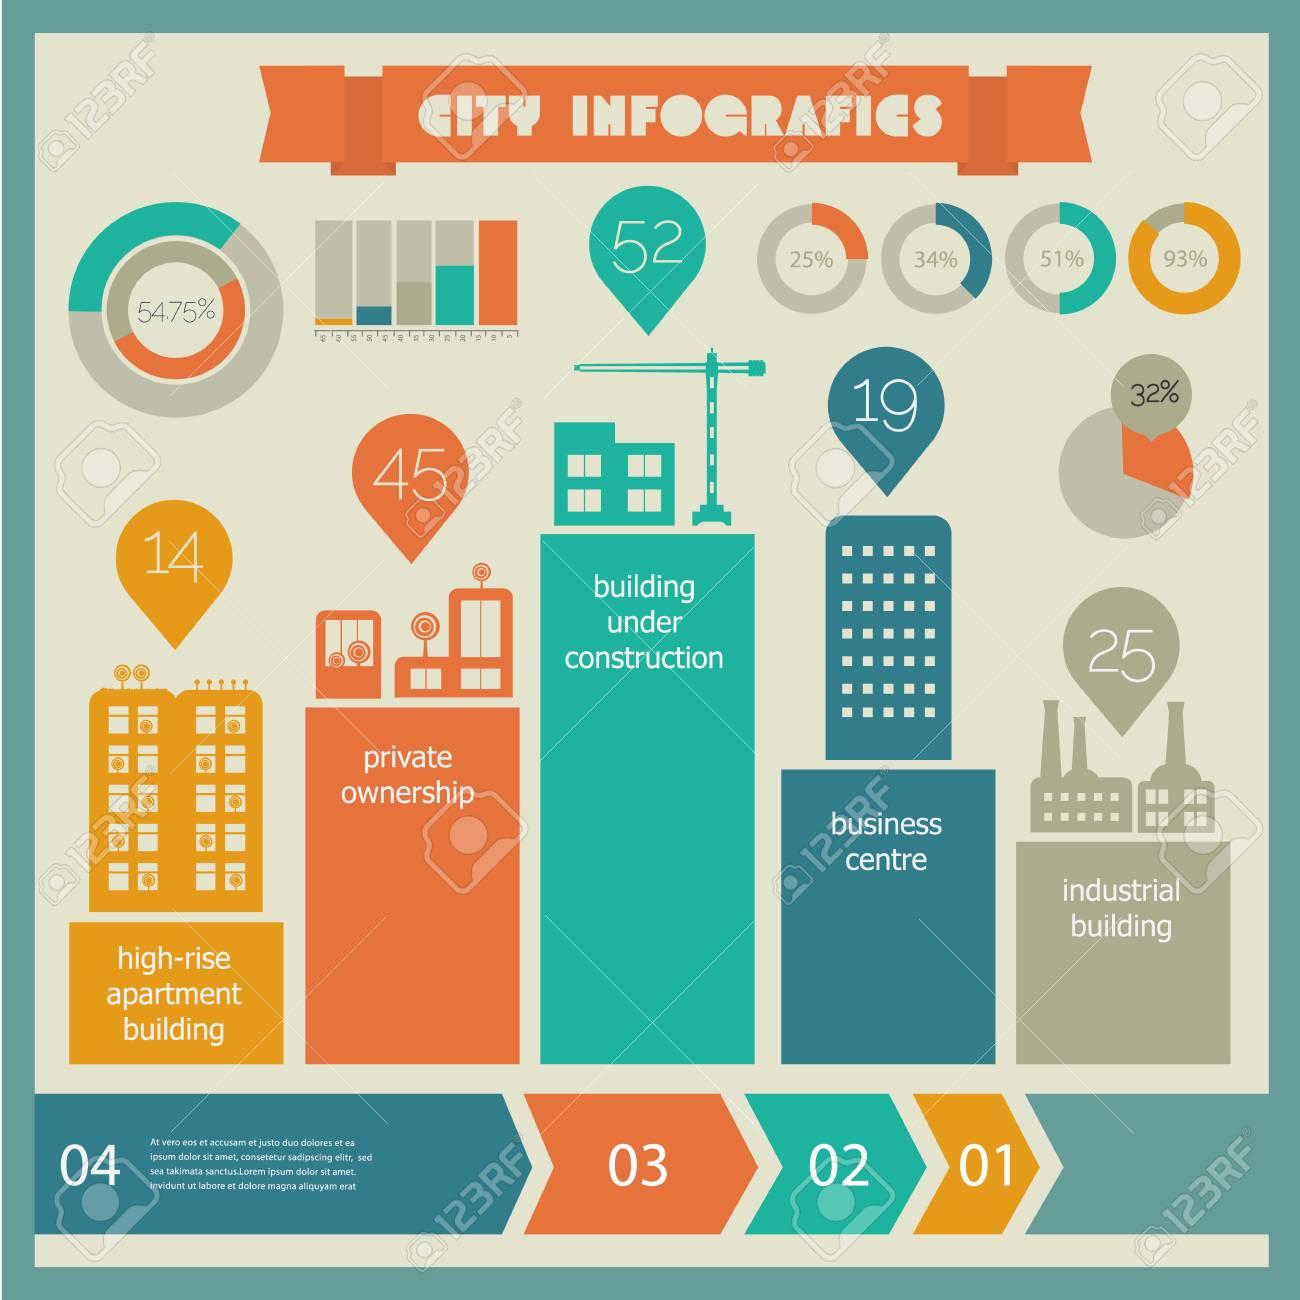 Flat Ui Design Futuristic Eco City Infographics Template With Steps